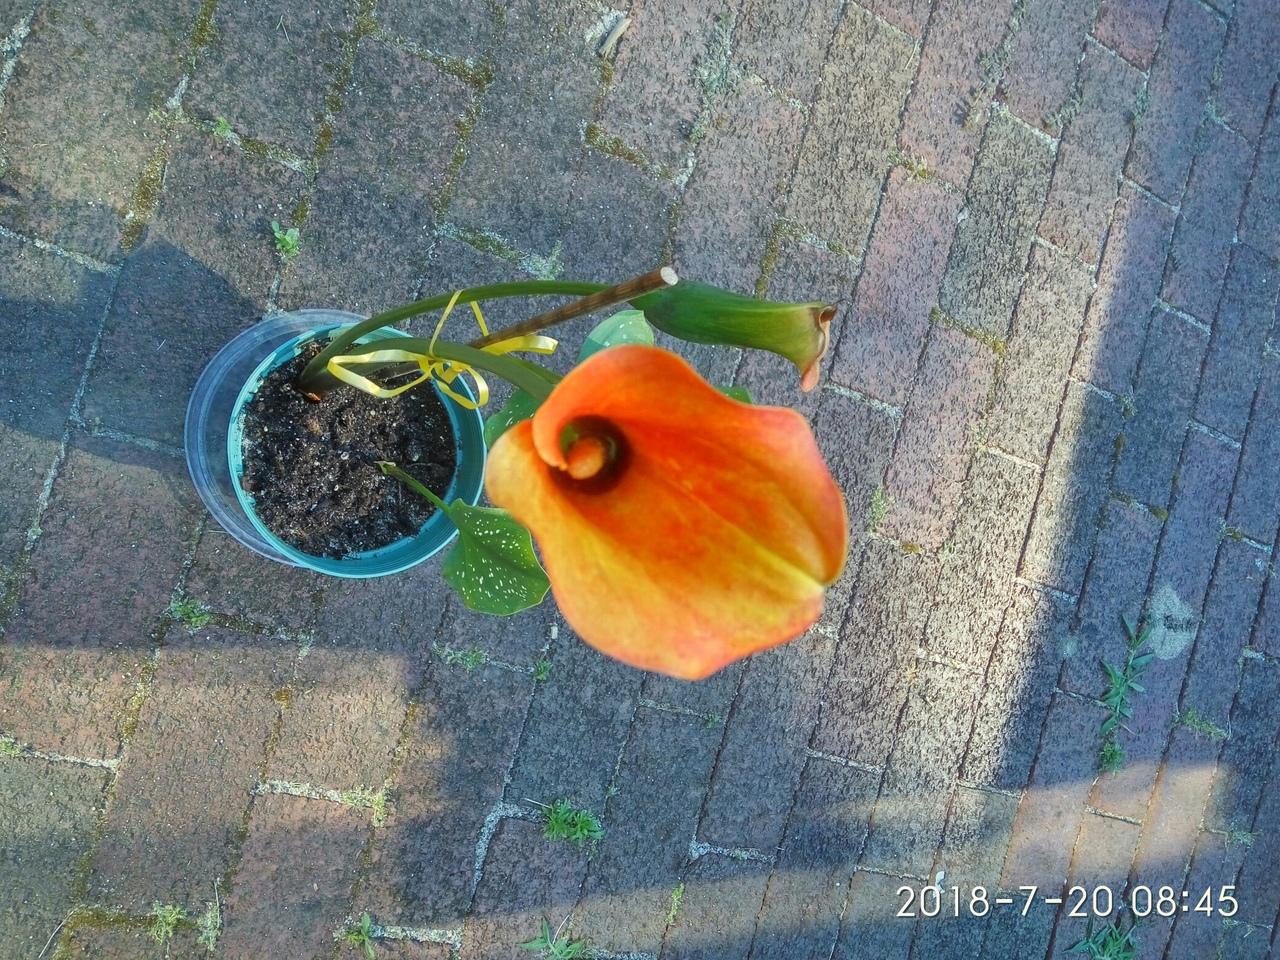 "Мои цветочки ... Занятие для души)))""  3qB4tuXbF-c"